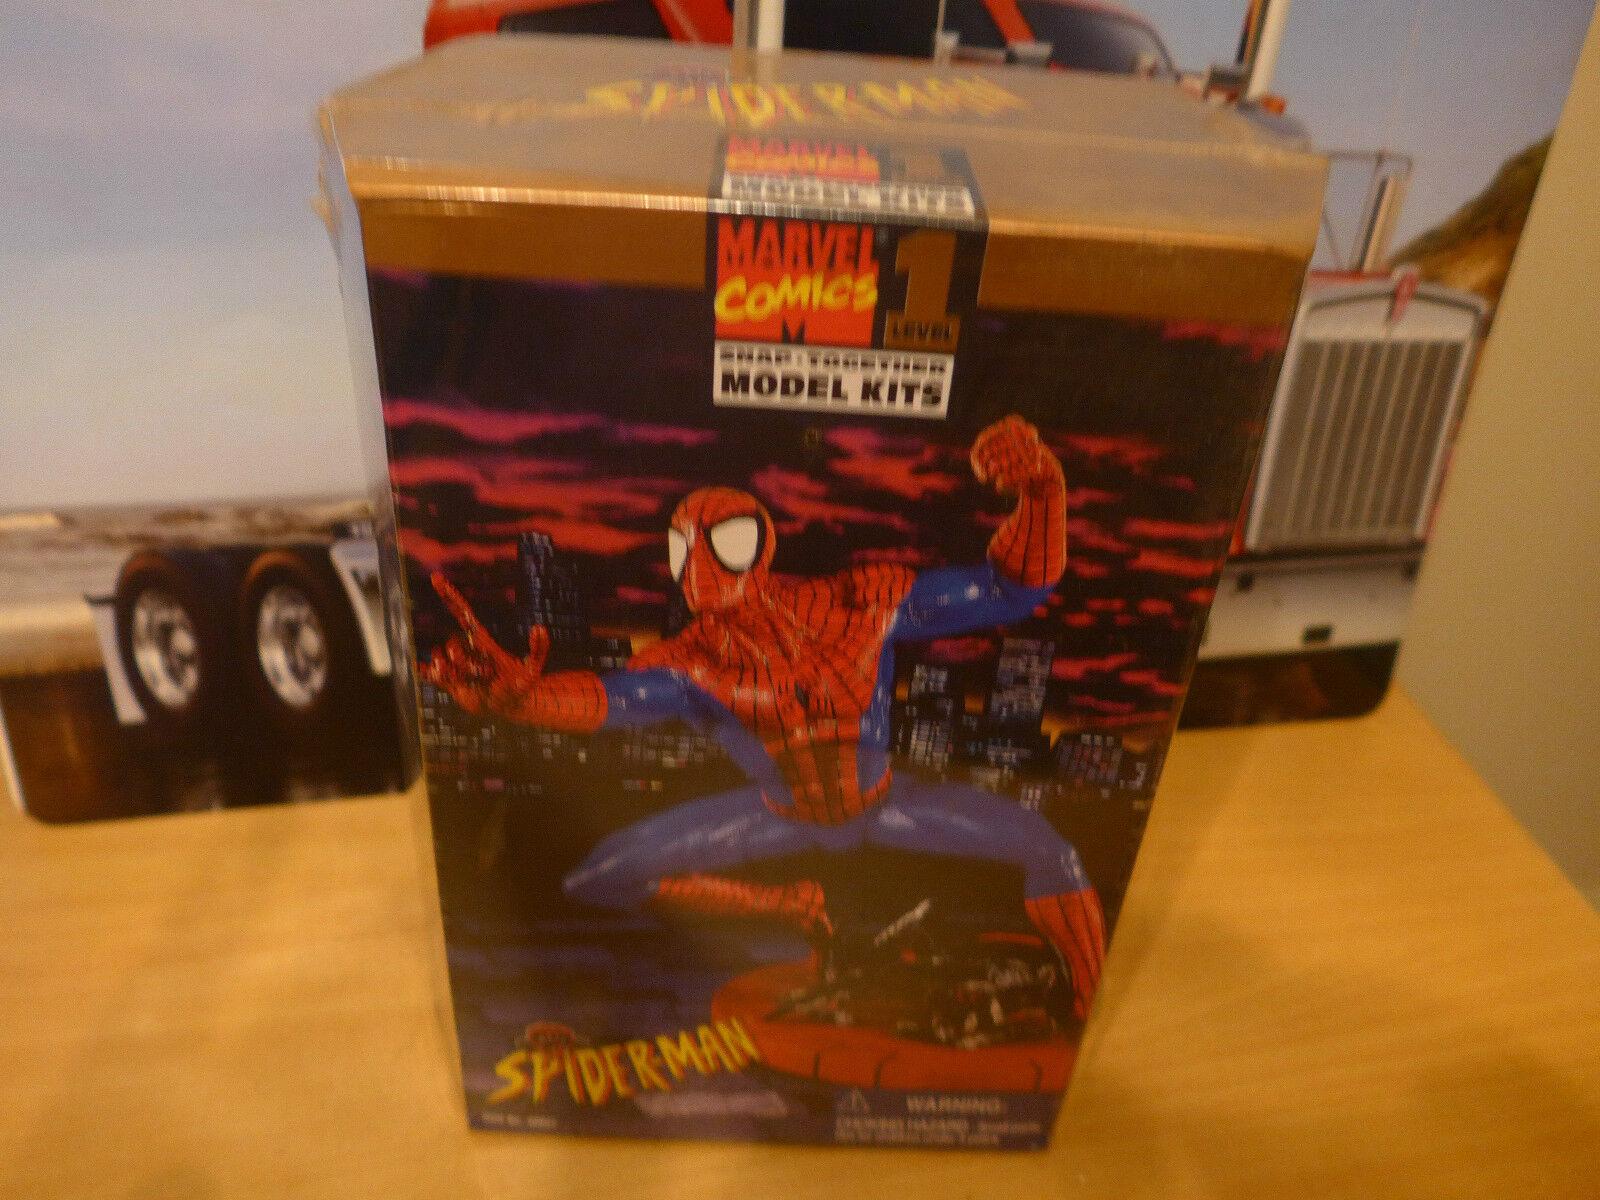 Marvel Comics Spider-uomo  snap together modellolo kit kit kit Level 1 sealed in scatola 849bb9